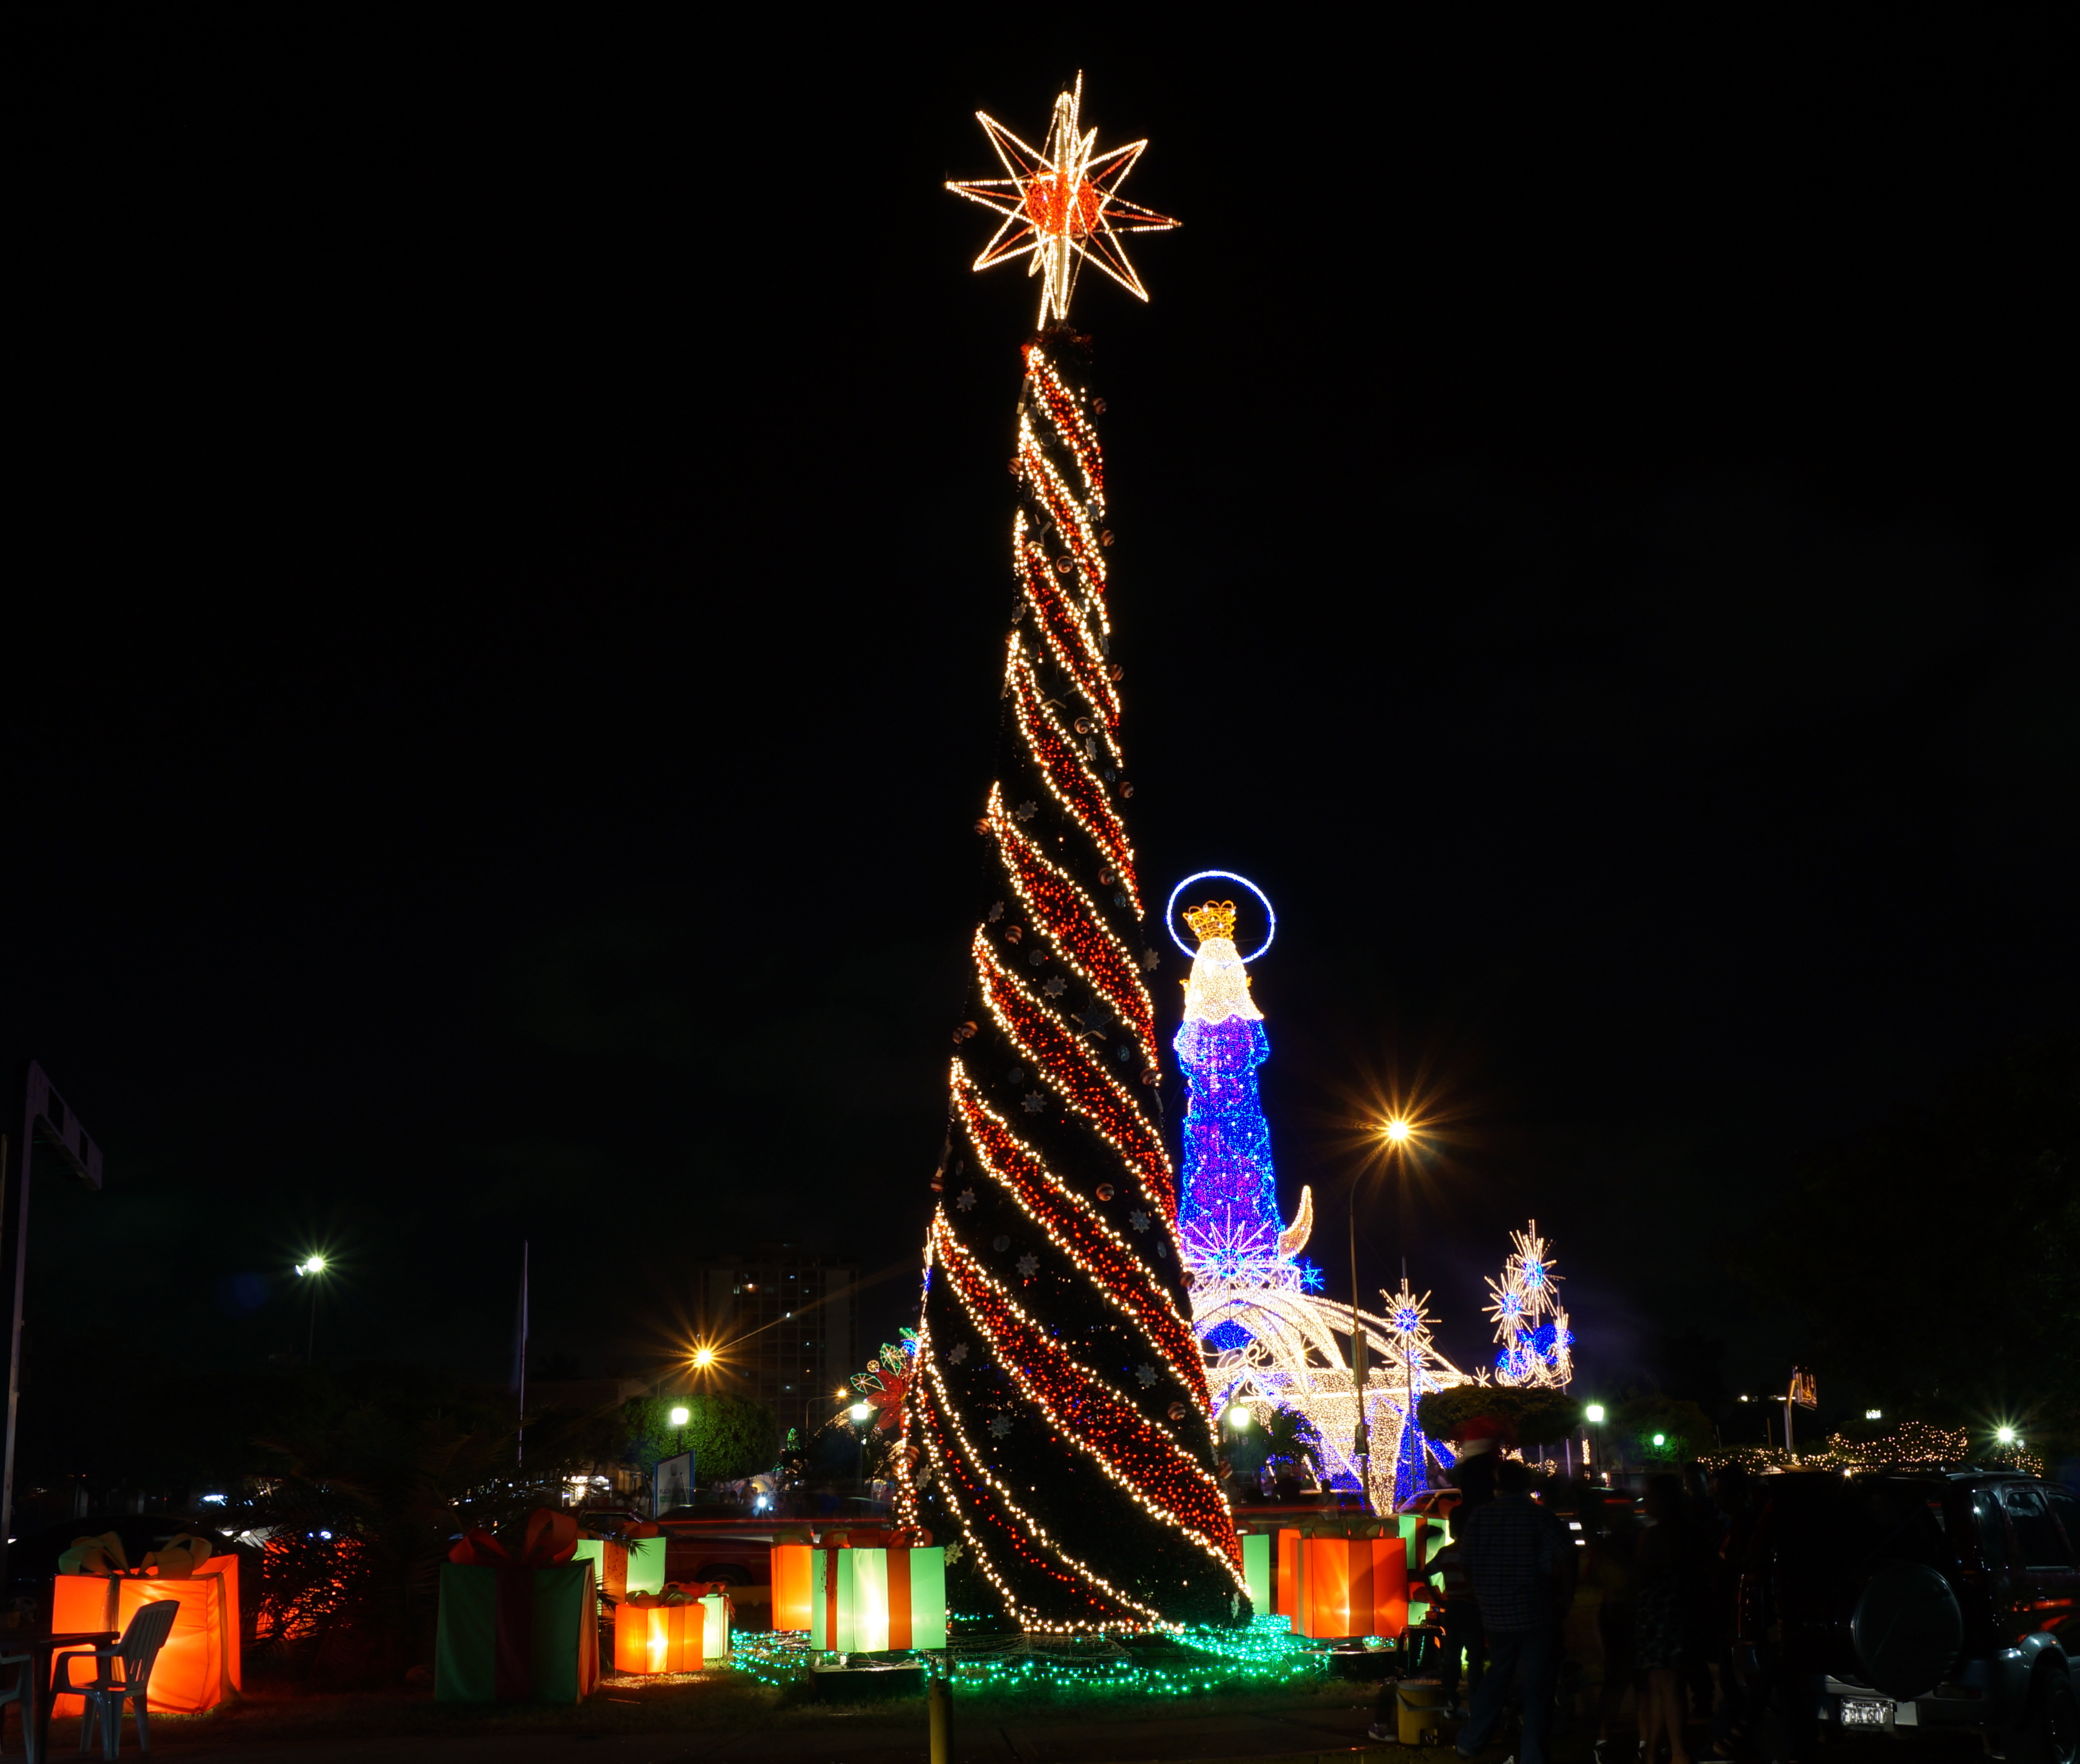 File arbol de navidad i jpg wikimedia commons - Arboles de navidad ...